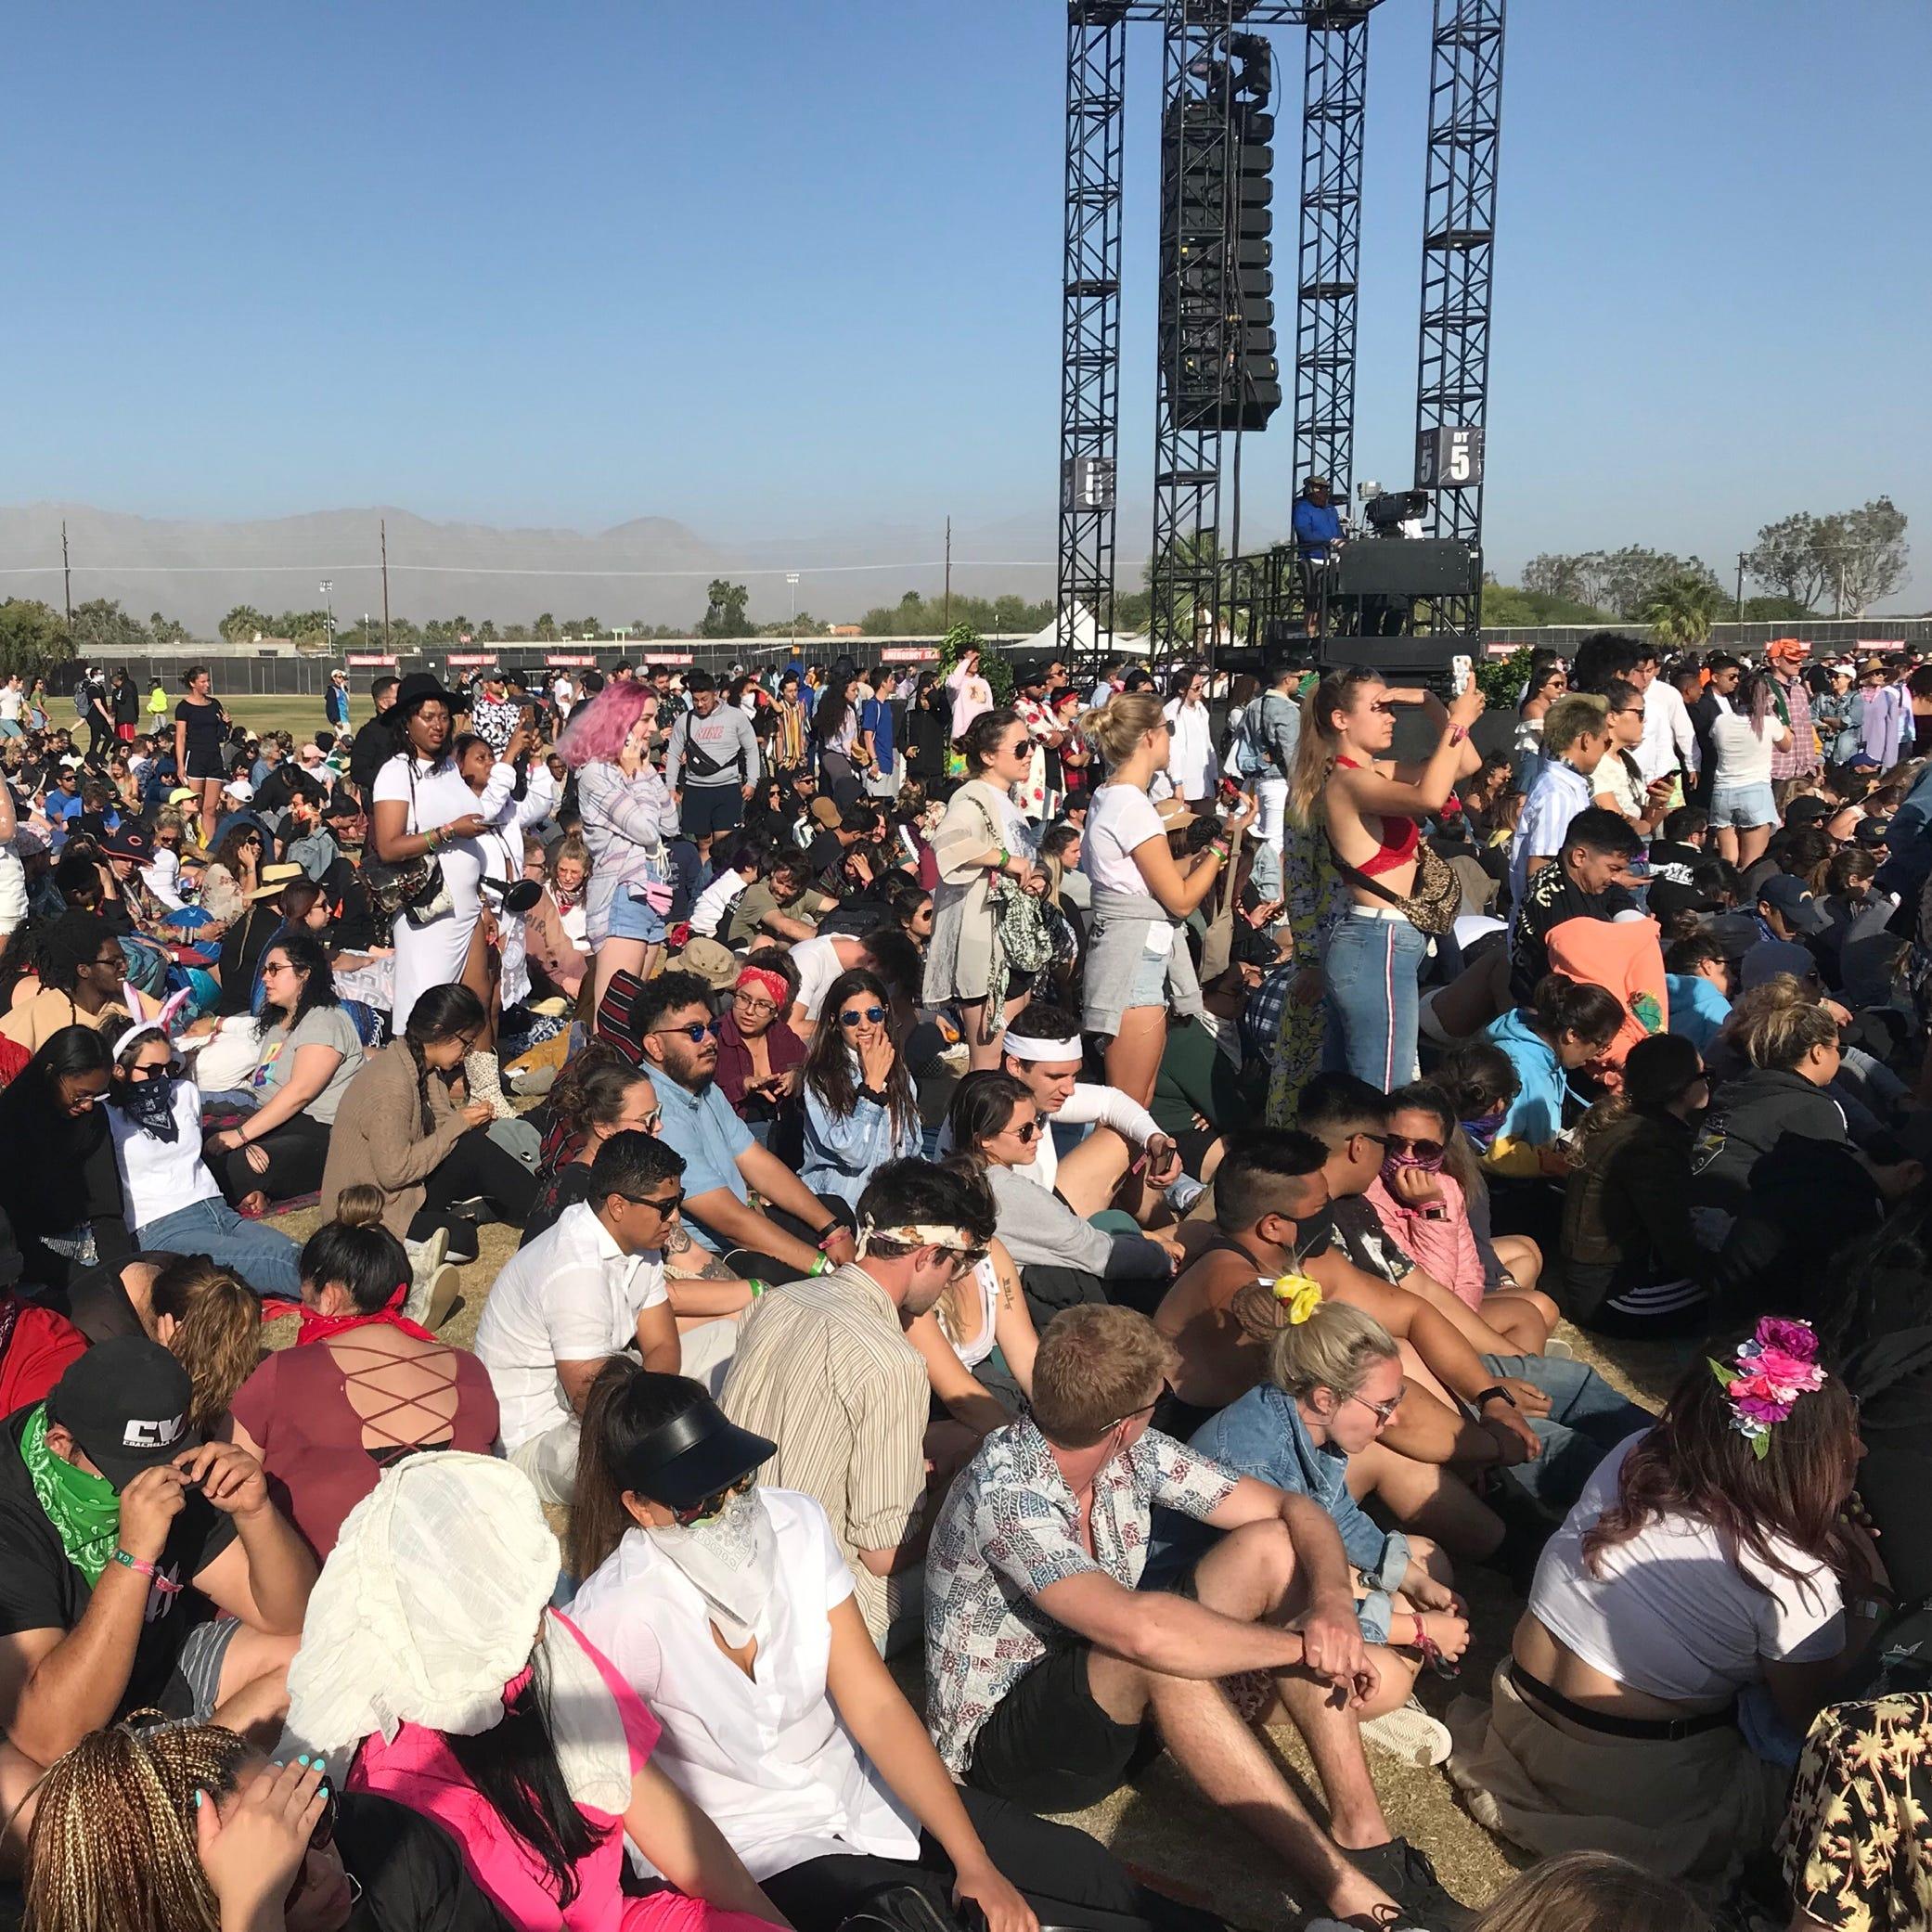 'Jesus Walks' at Coachella in Kanye West's historic Sunday Service